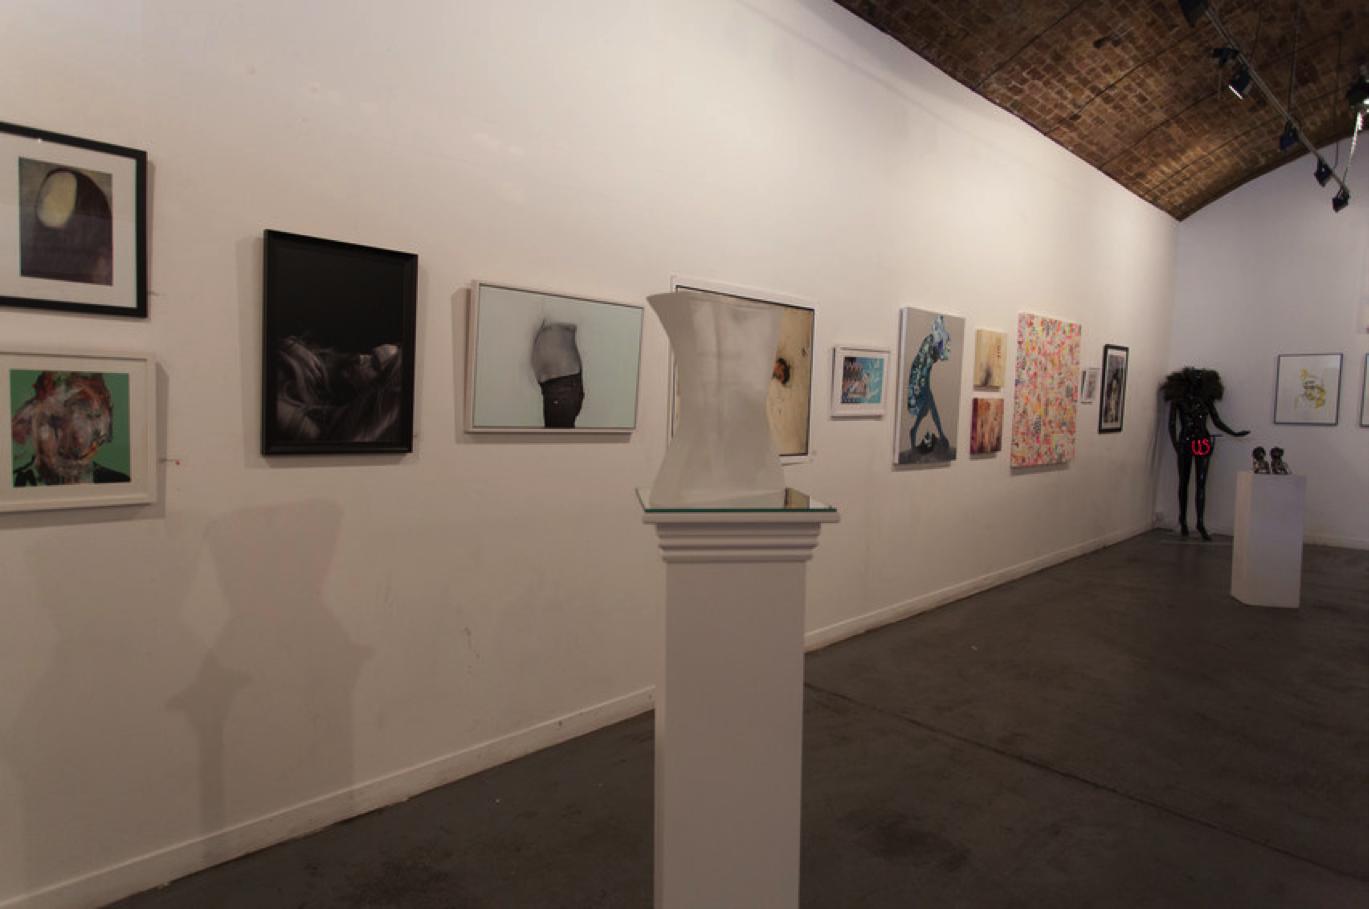 Seams Exhibition at Hoxton Arches